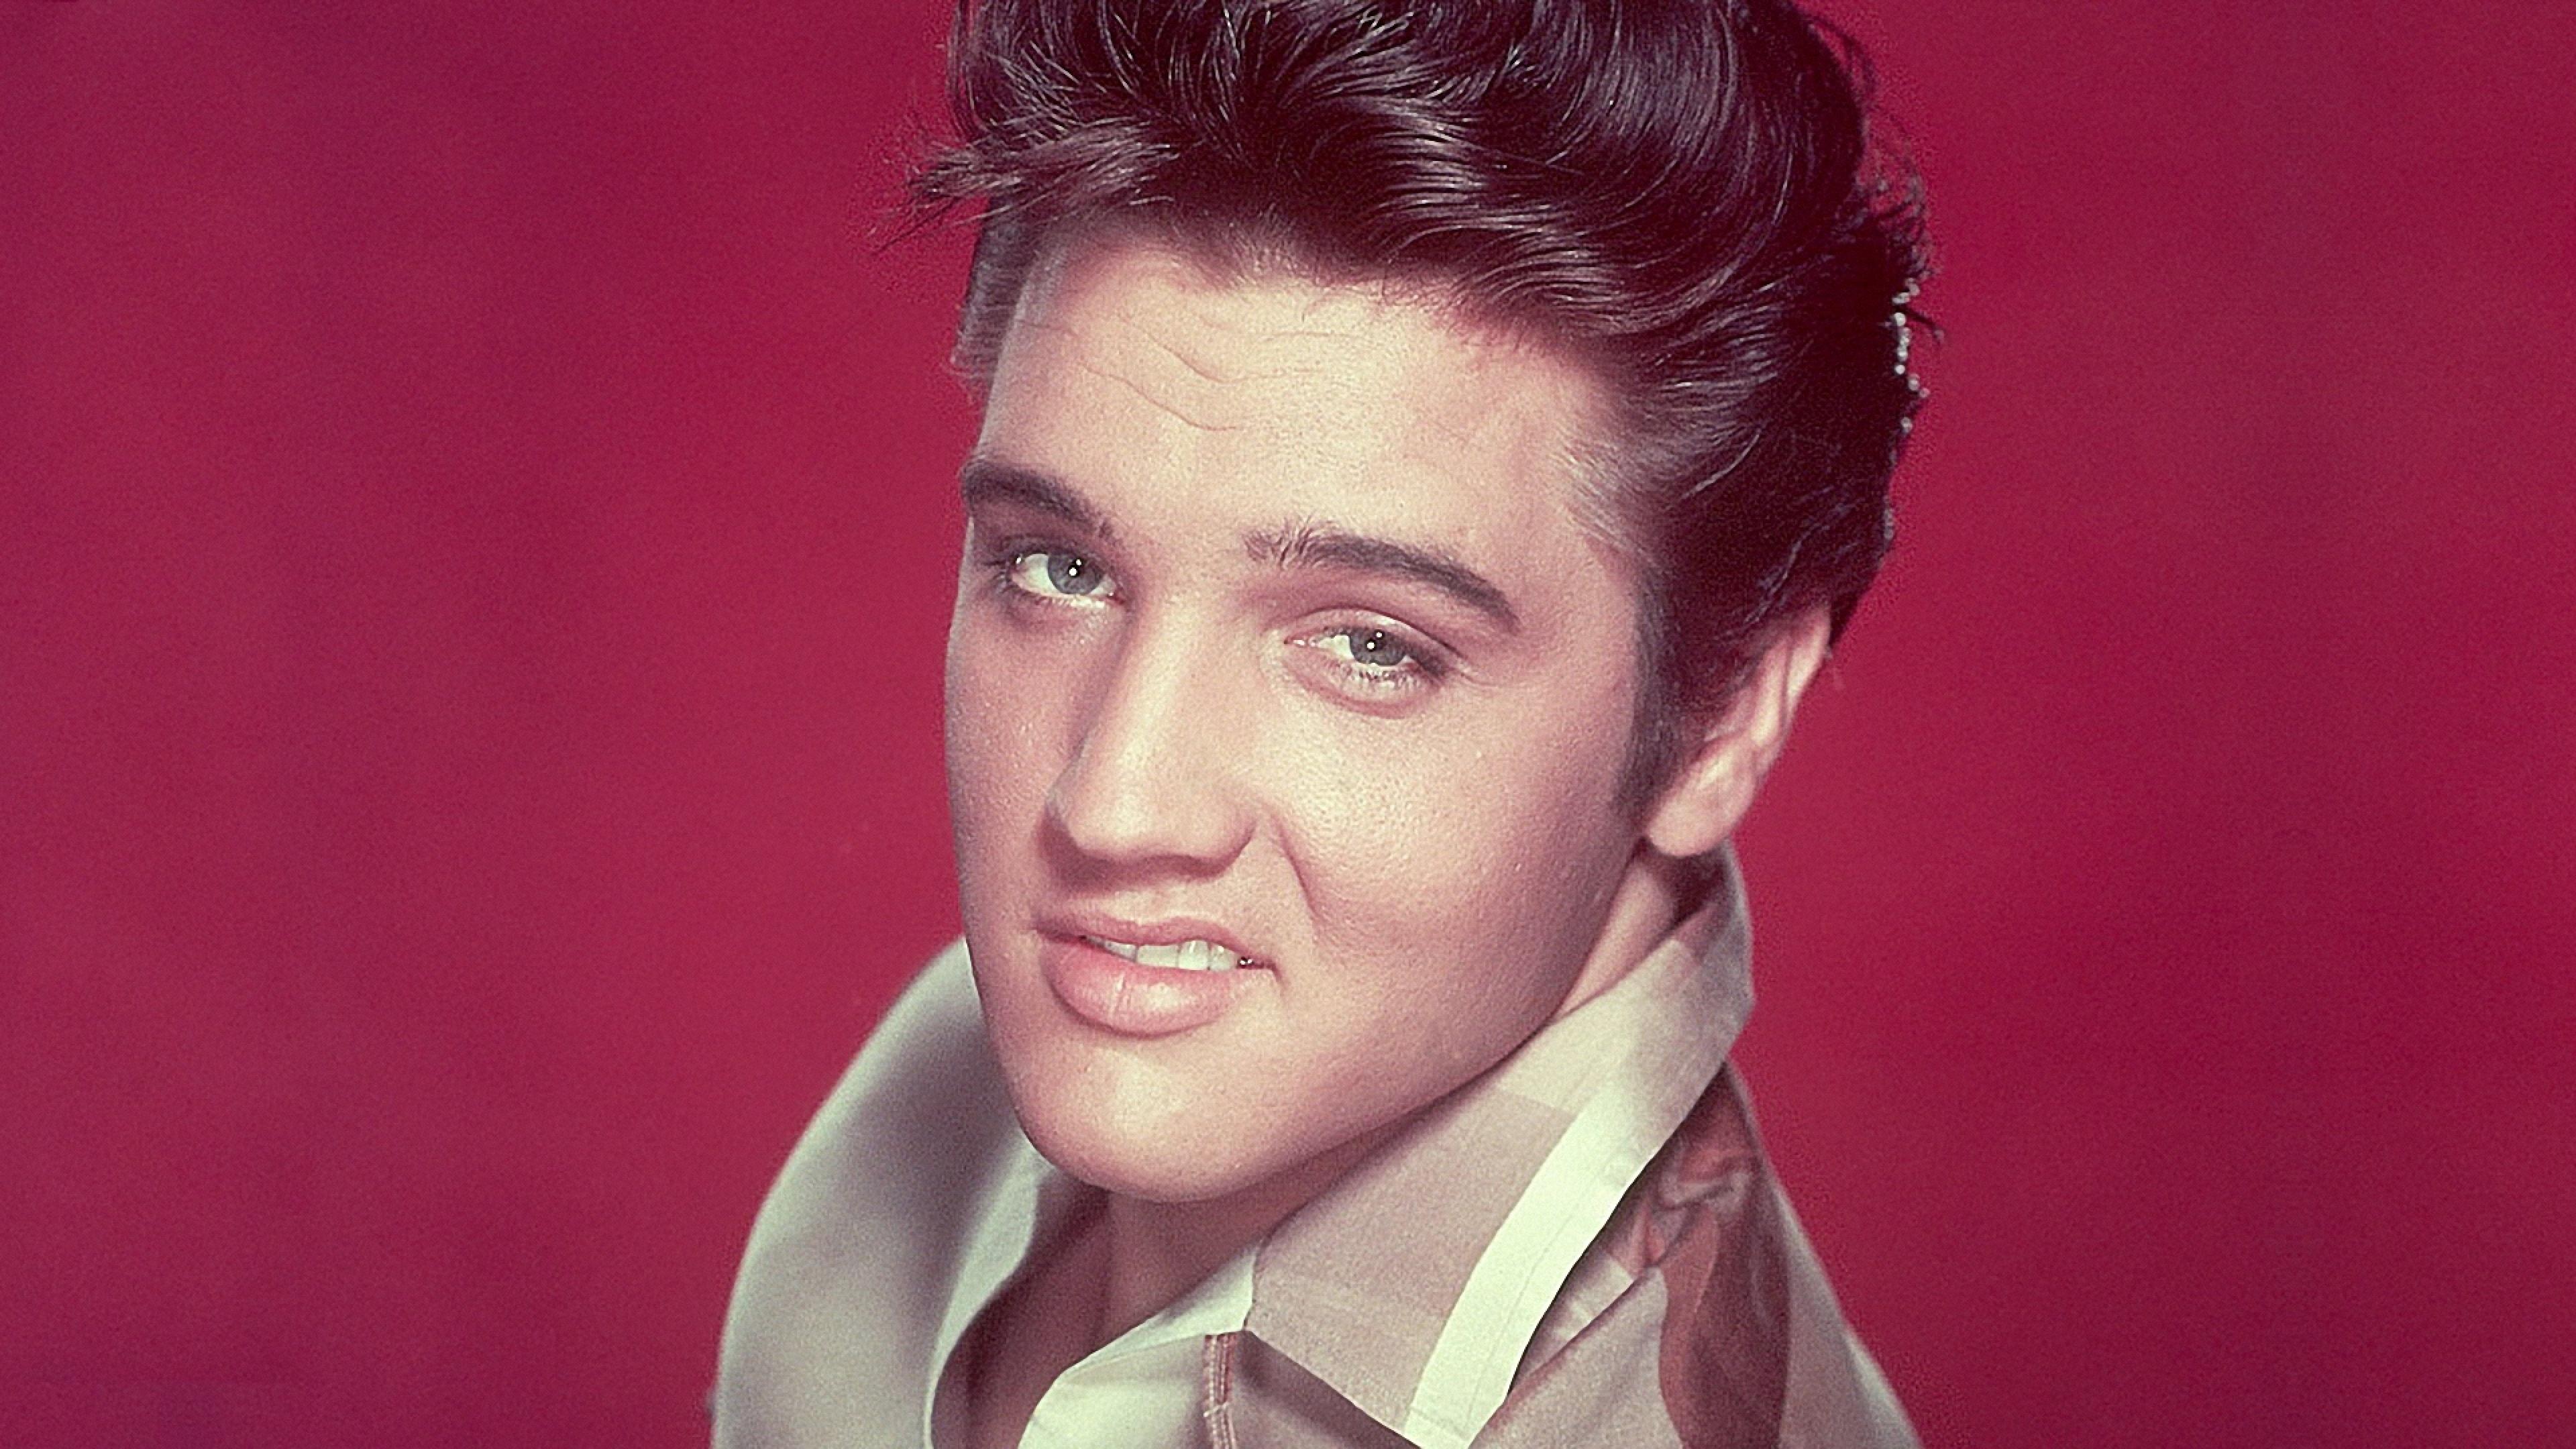 Elvis Presley Backgrounds